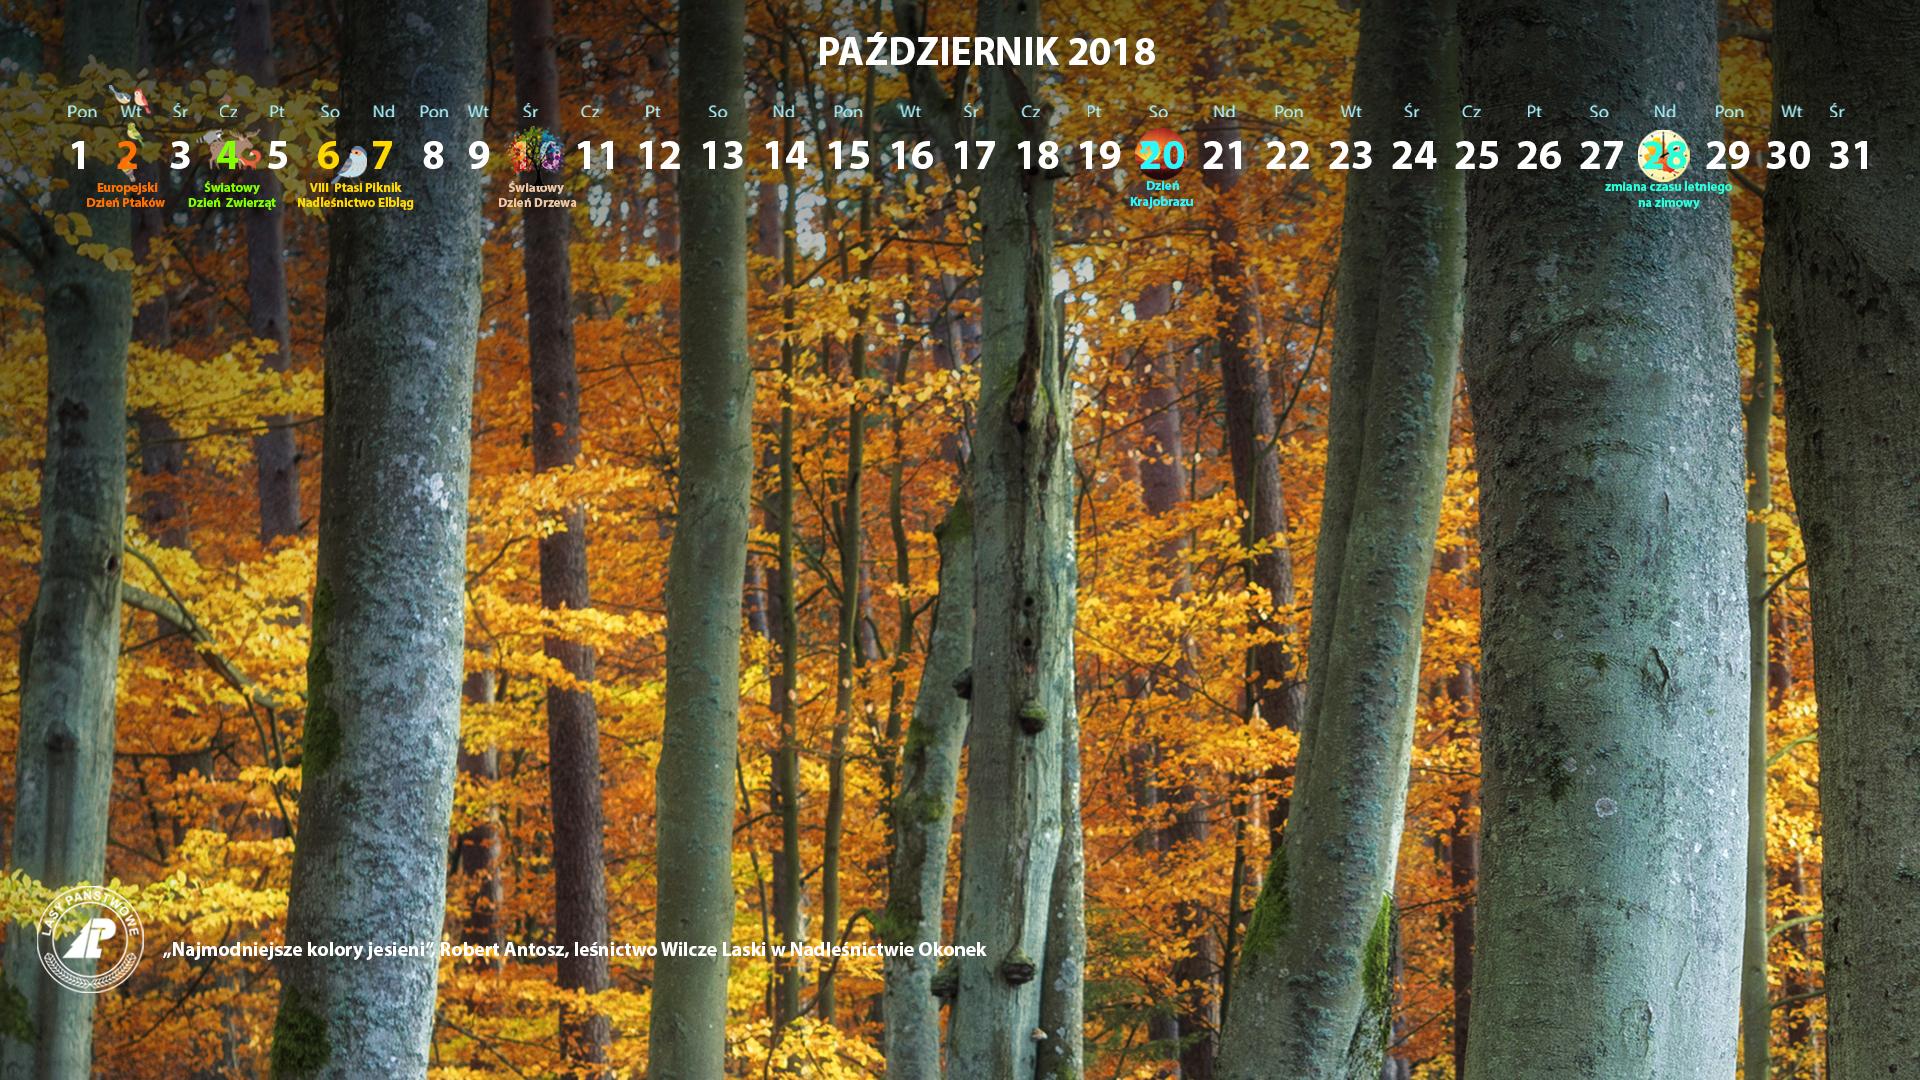 Kalendarz_październik_2018_1920x1080[1].jpg